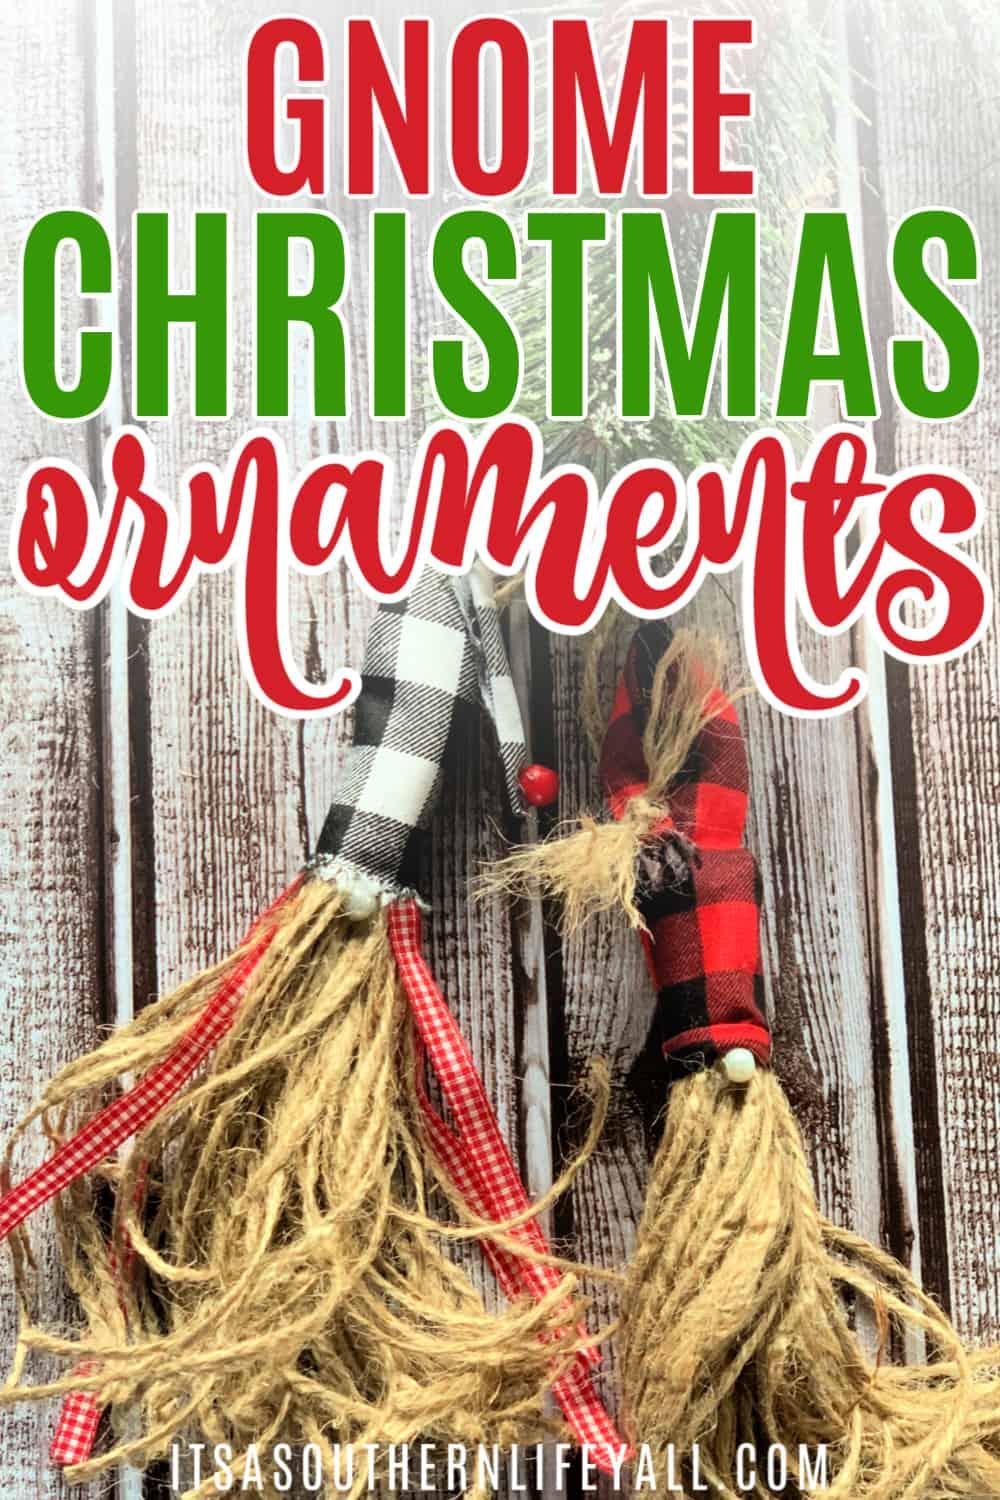 Gnome Christmas Ornaments